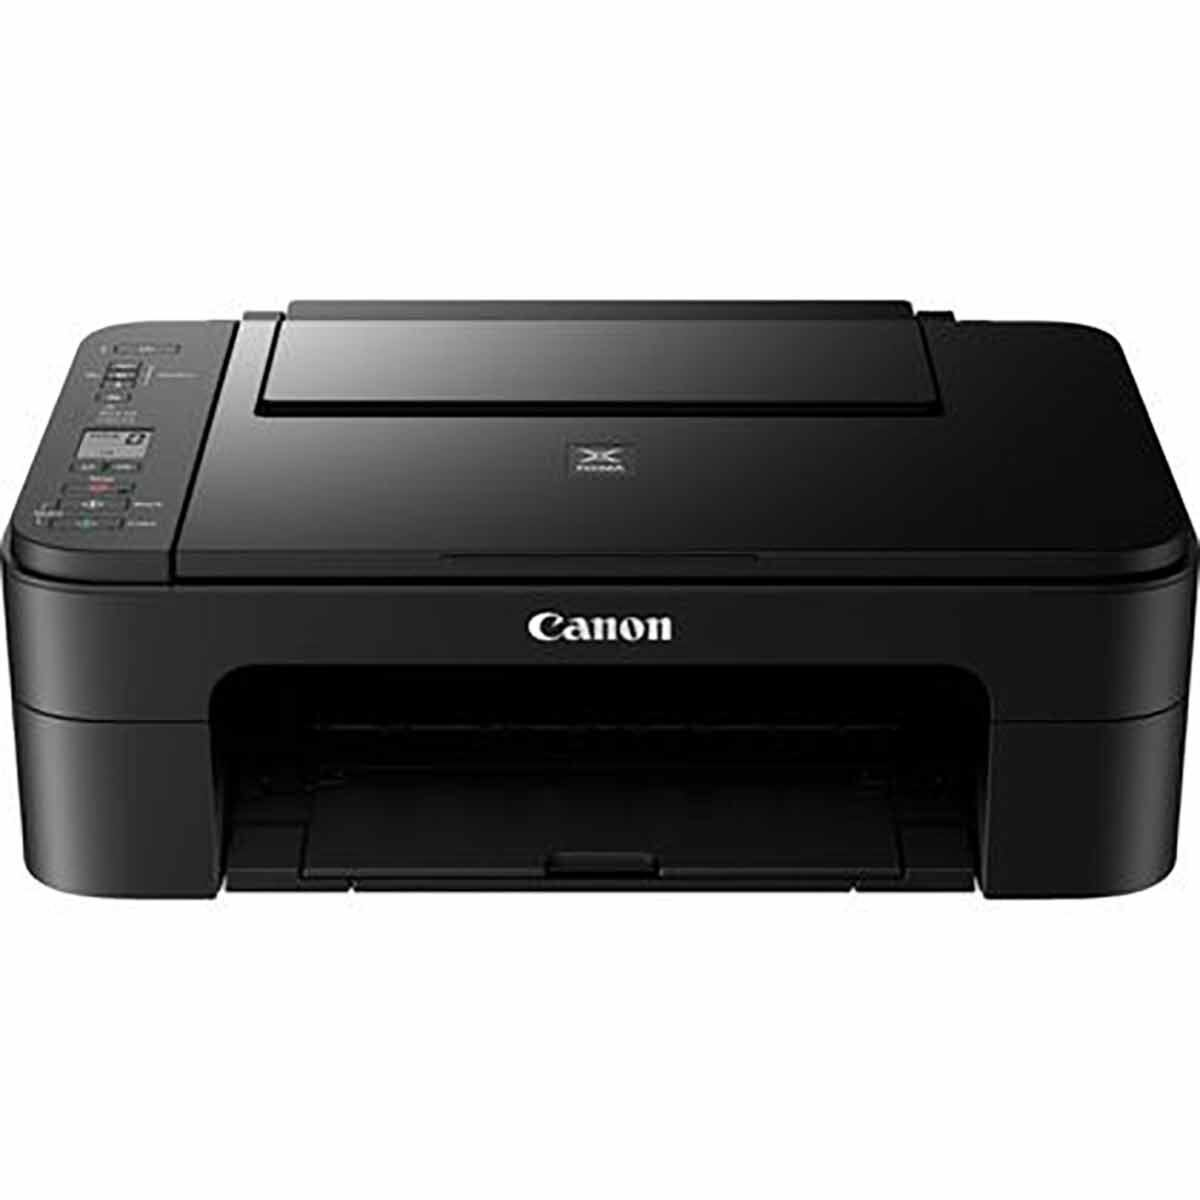 Canon PIXMA TS3350 Multifunctional Inkjet Printer